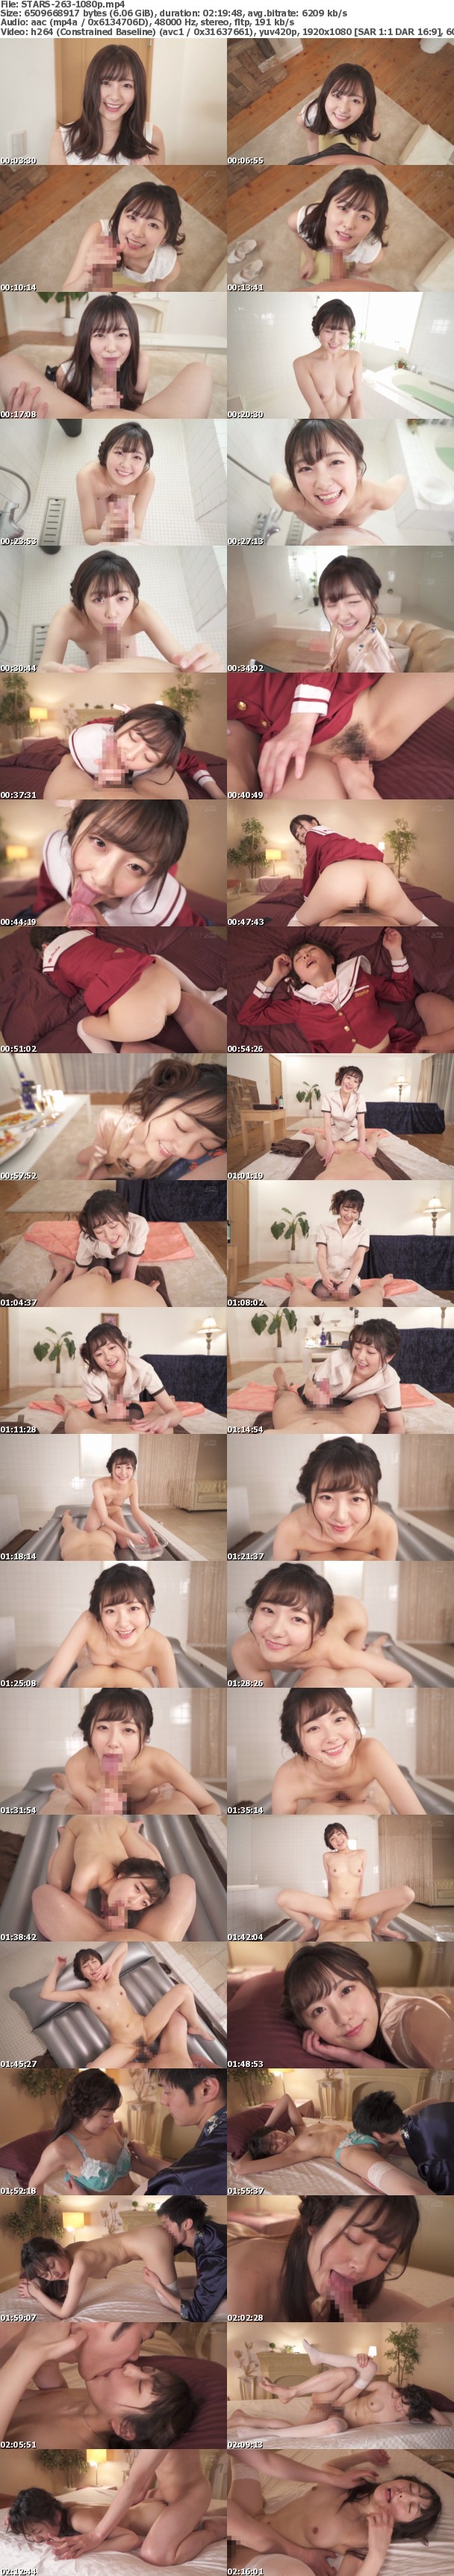 (Full HD) STARS-263 青空ひかり 最高なおもてなしと笑顔で指名率ダントツNO.1!超高級超神対応デリヘル嬢